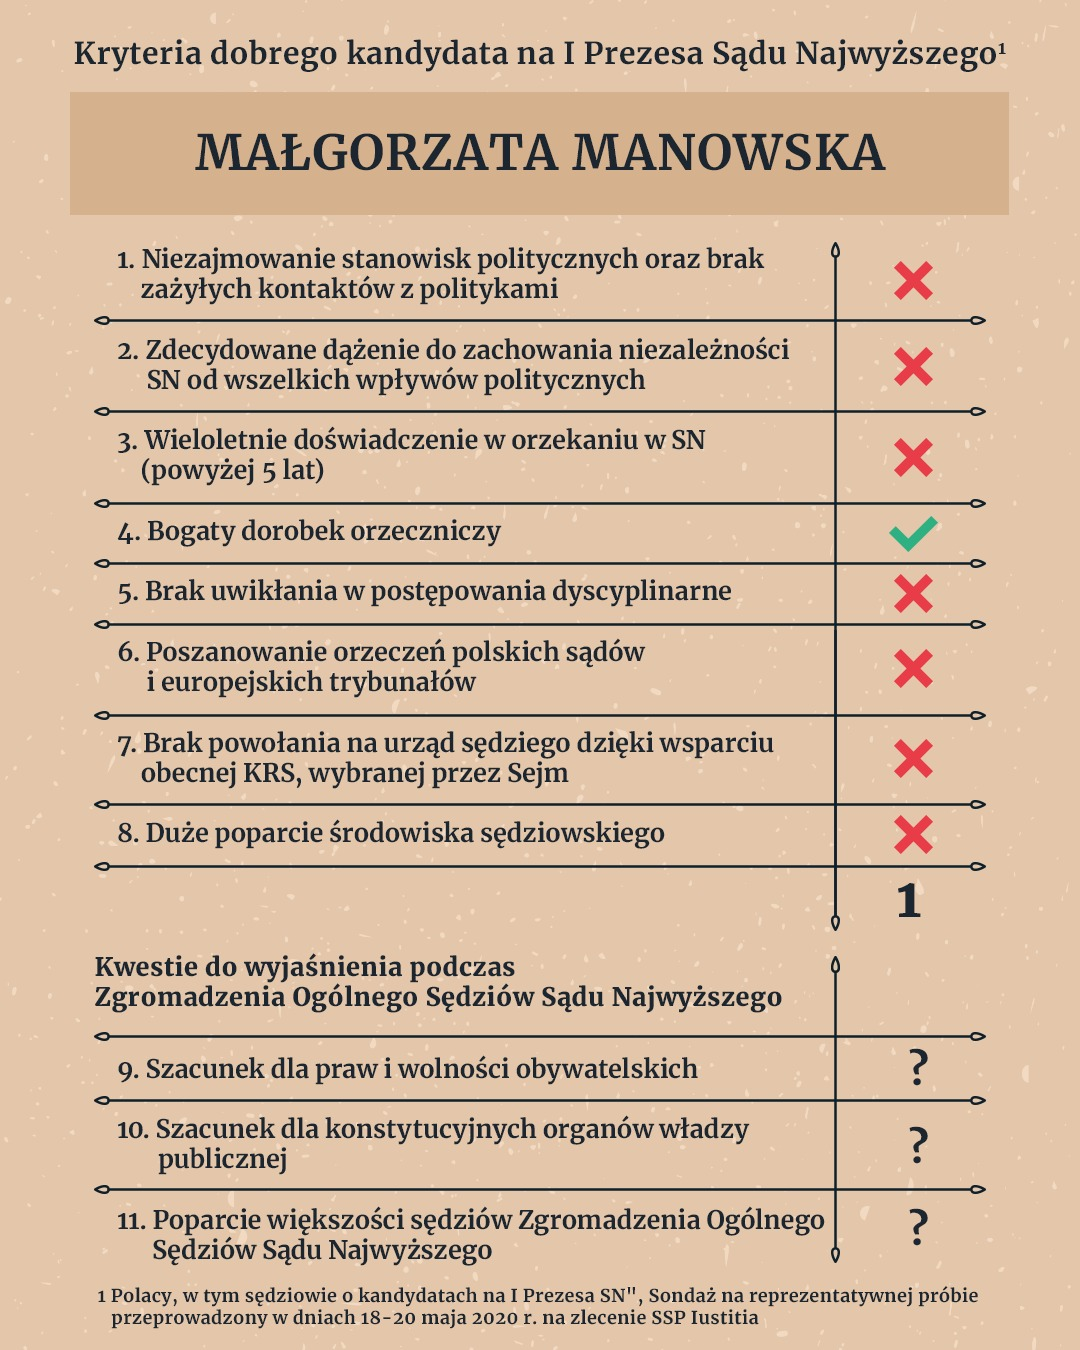 https://tvn24.pl/najnowsze/article4593362.ece/Manowska_Ma%25C5%2582gorzata.jpeg